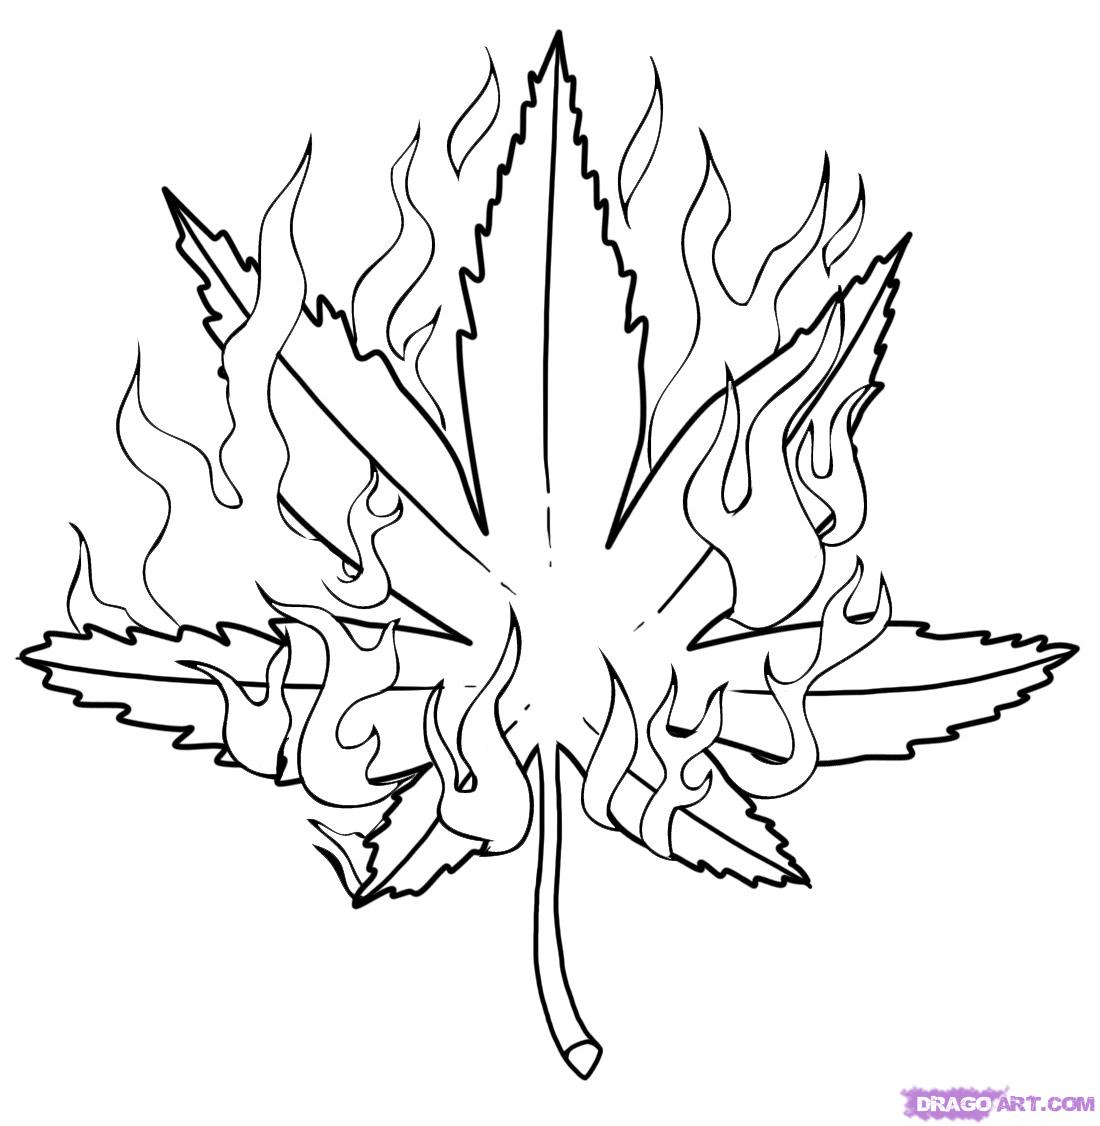 1100x1126 How To Draw A Fairy Tattoo Step By Tattoos Pop Culture Free Tattoo